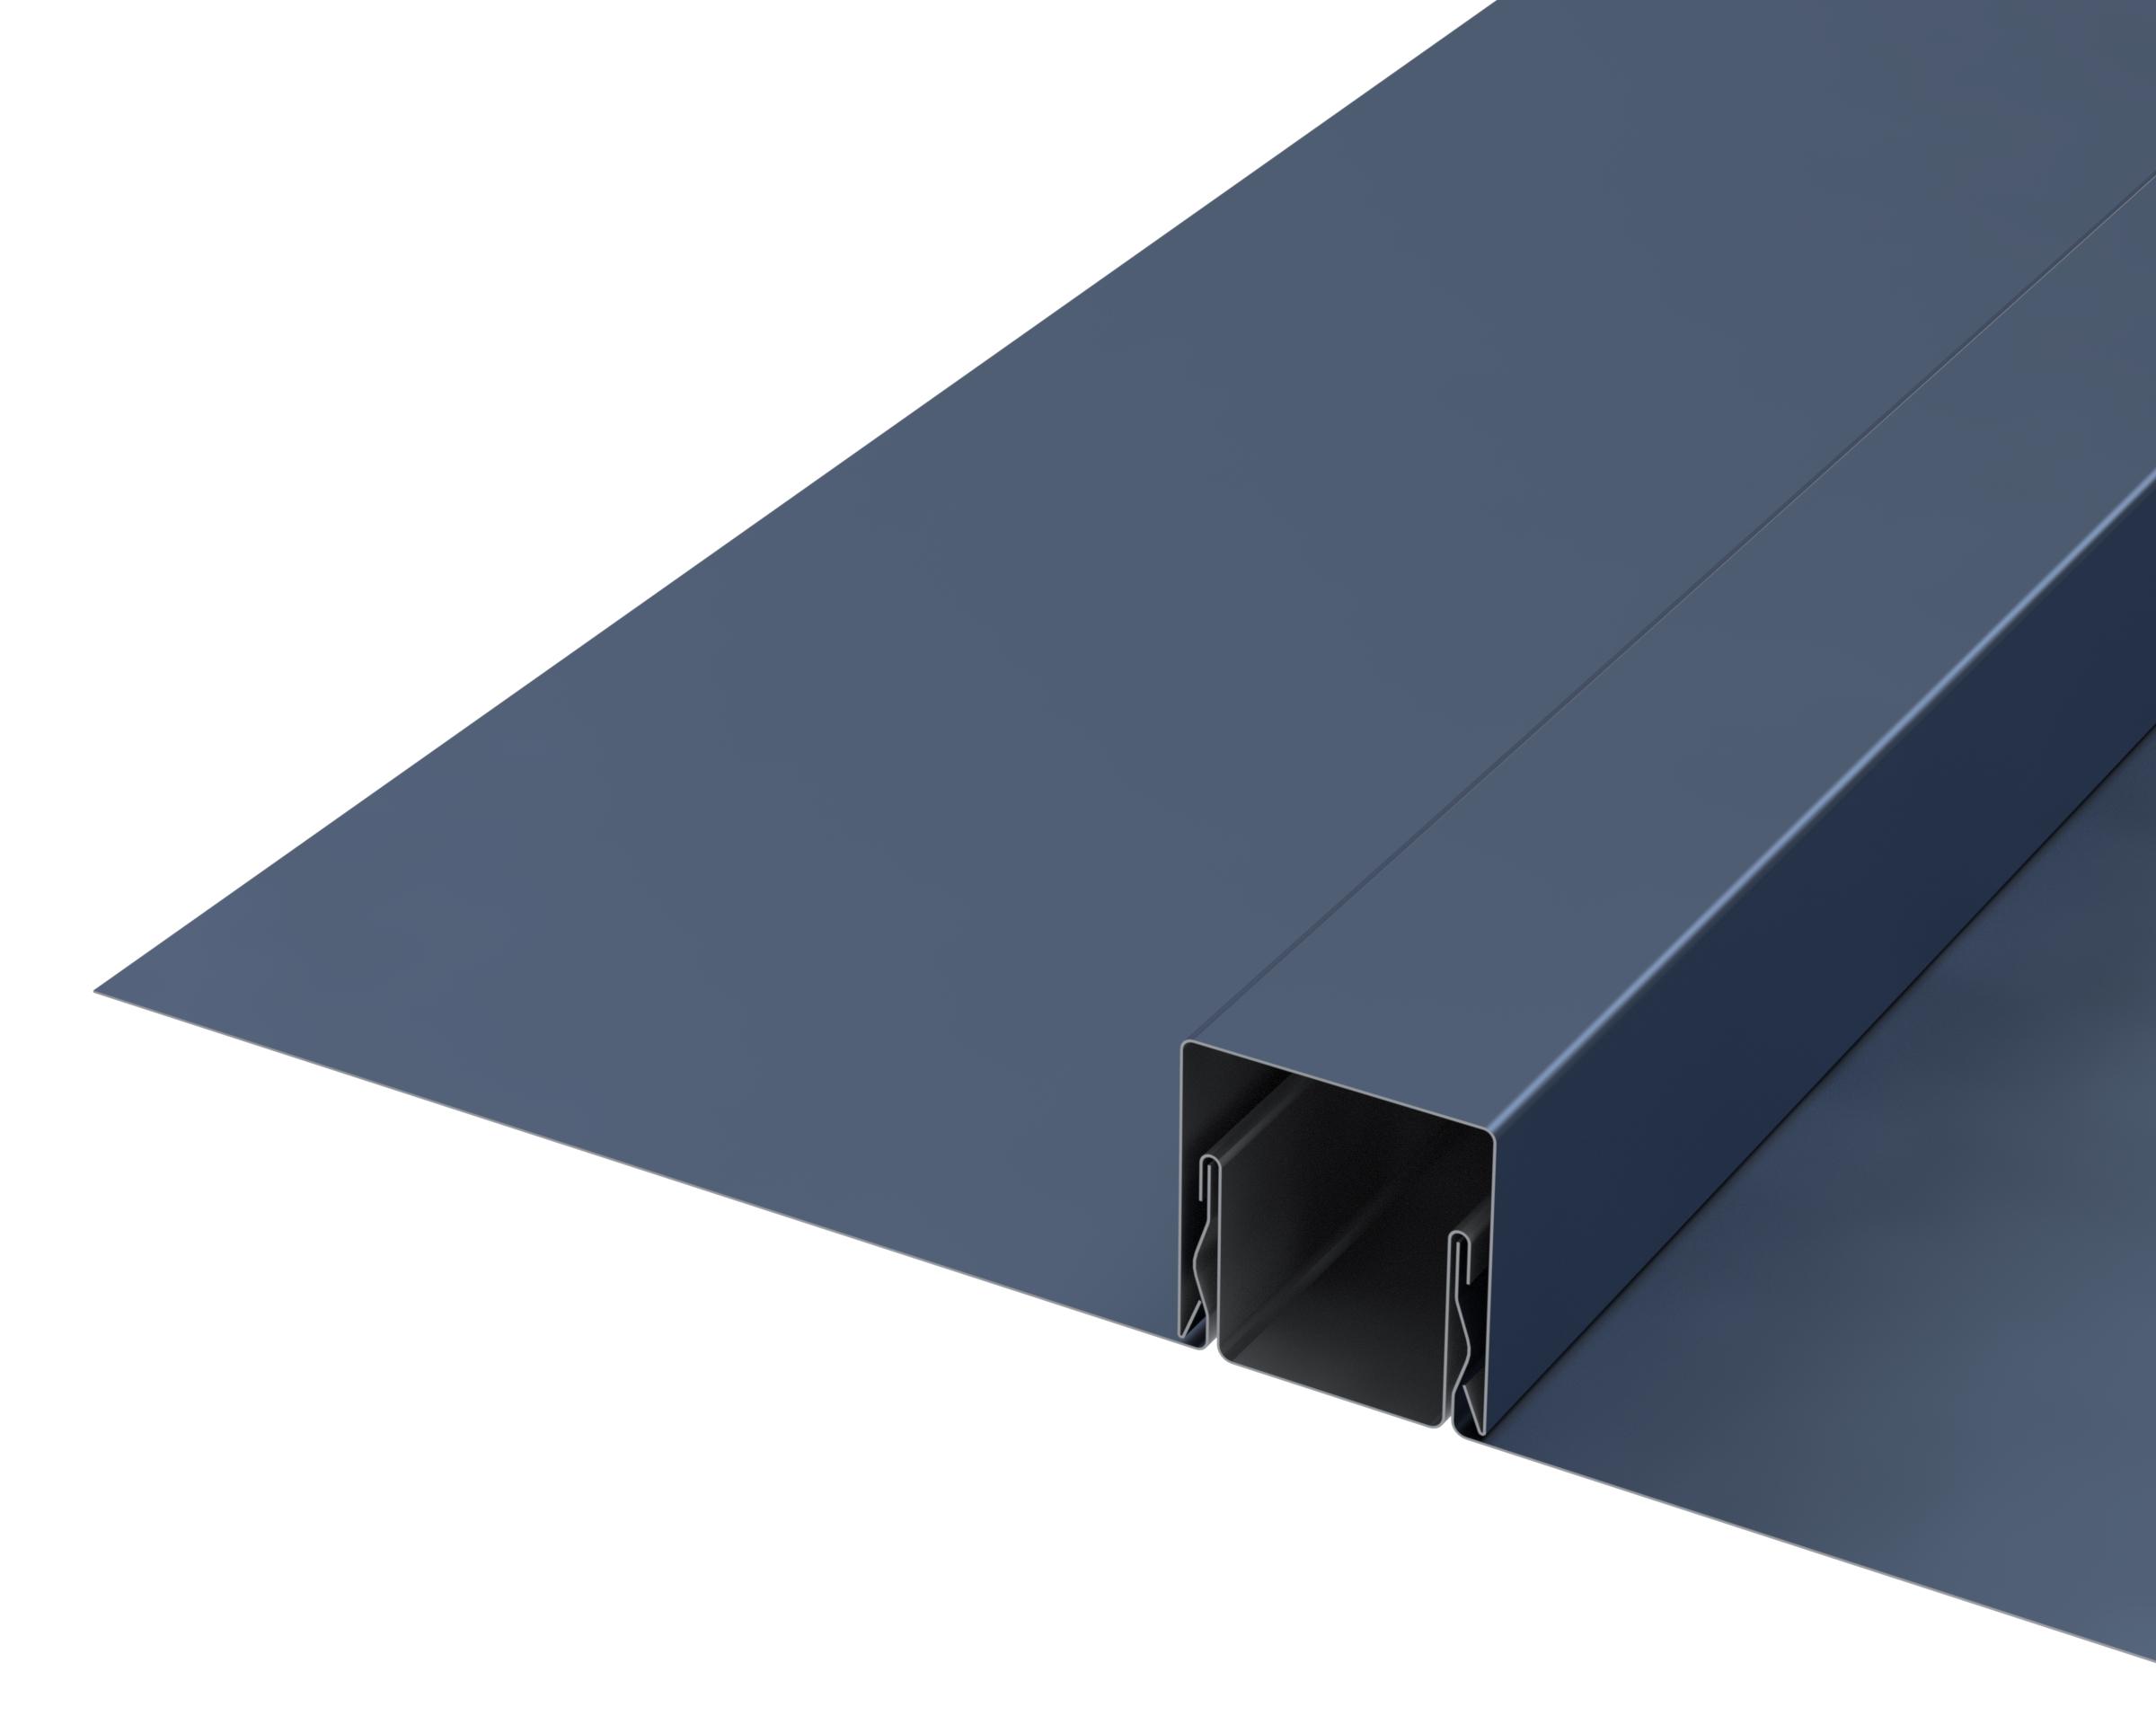 Batten Seam Bs15 Non Structural Standing Seam Panel